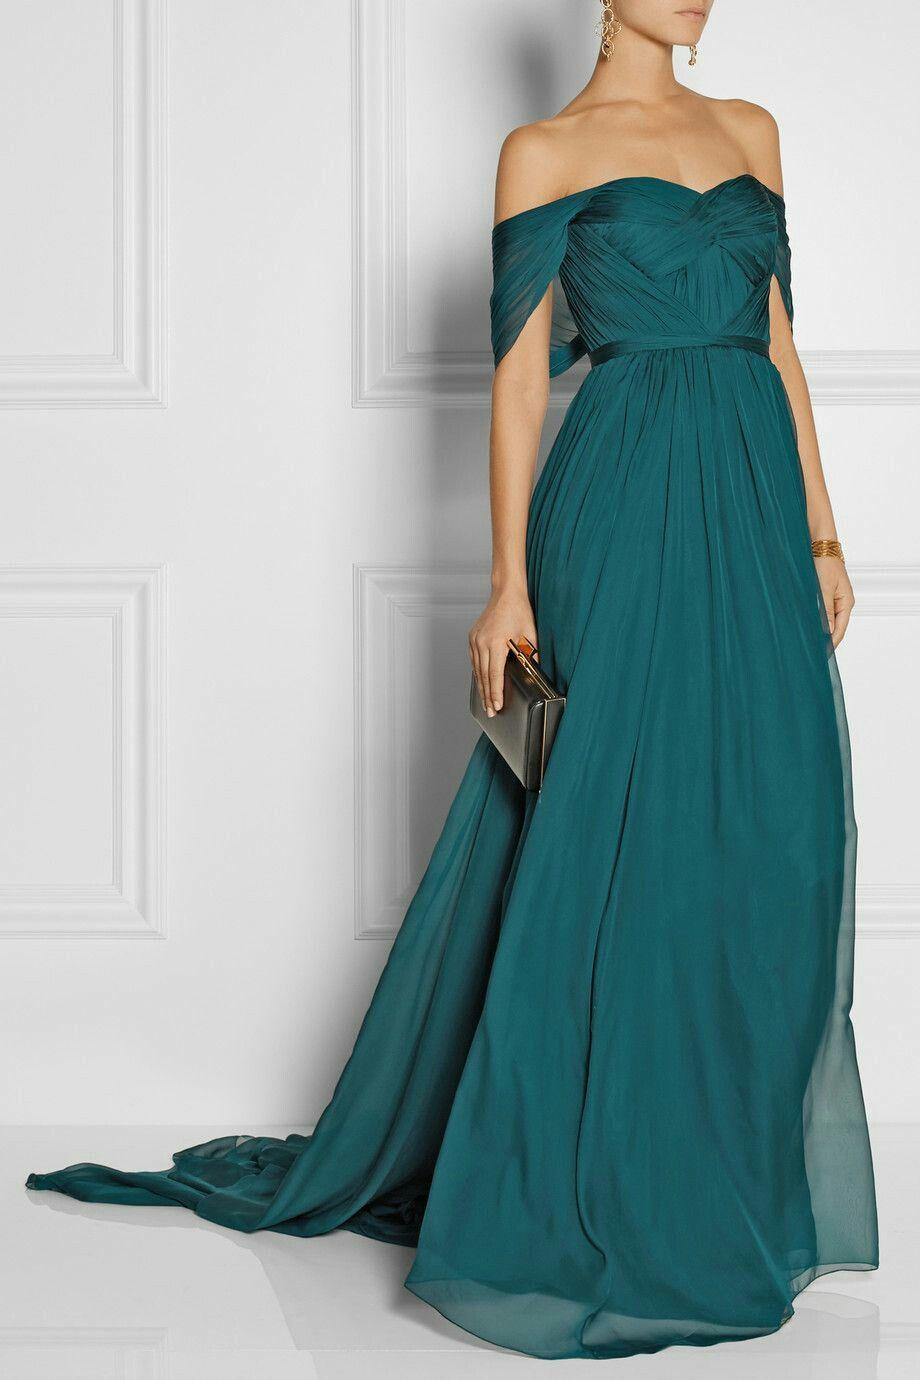 Off Shoulder Evening Gown With Sweetheart Neckline | Neckline, Gowns ...